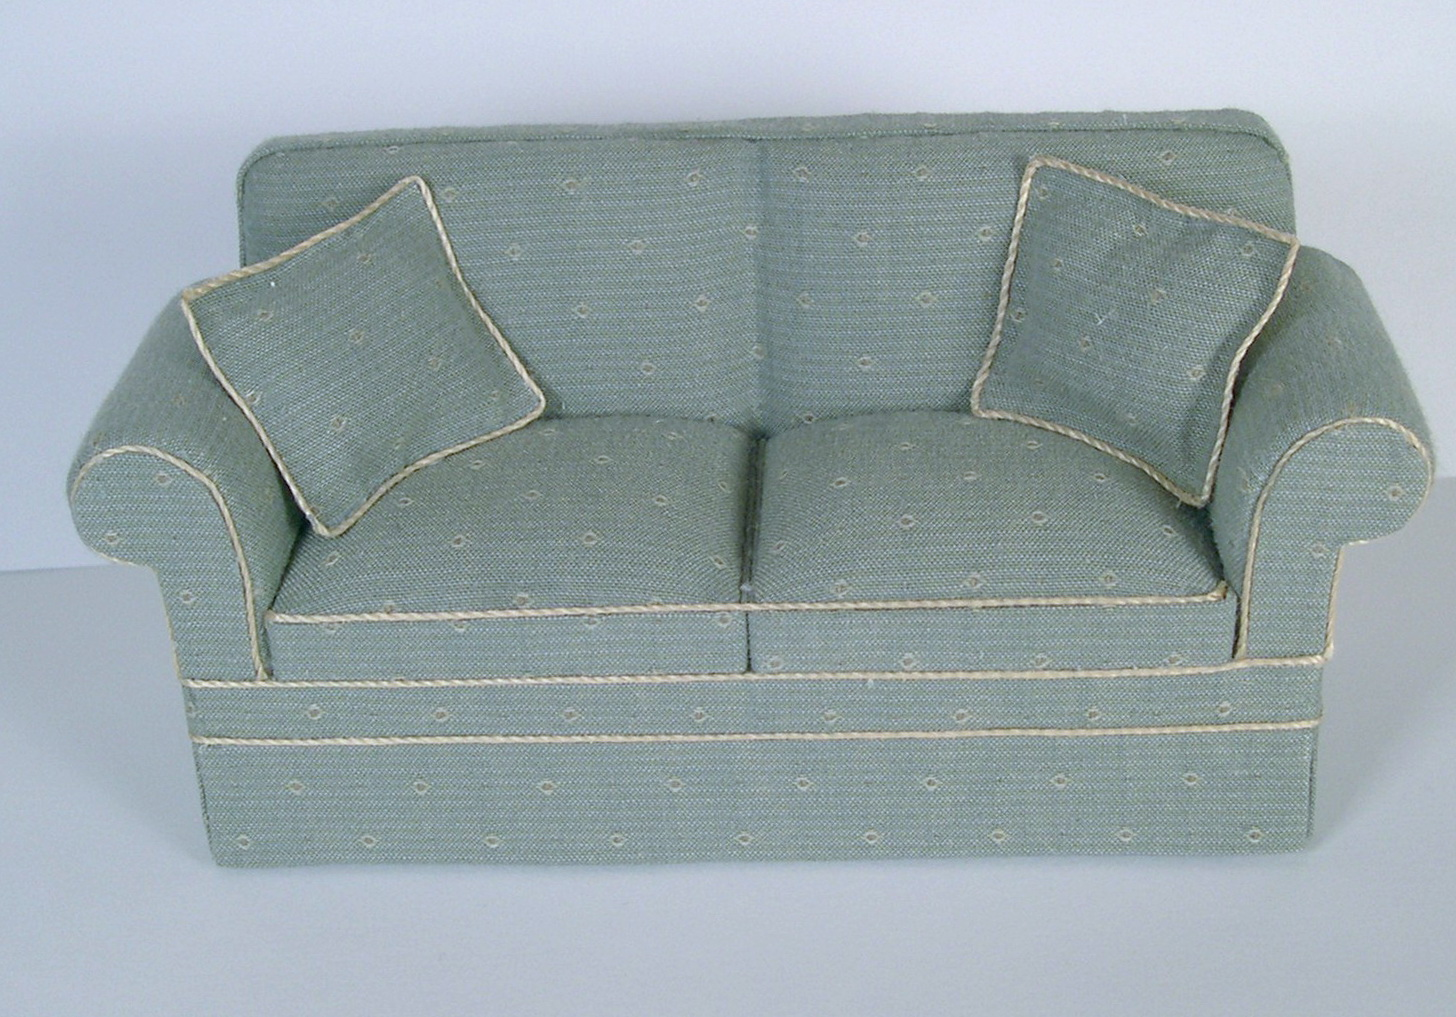 T Cushion Chair Slipcovers 2 Piece